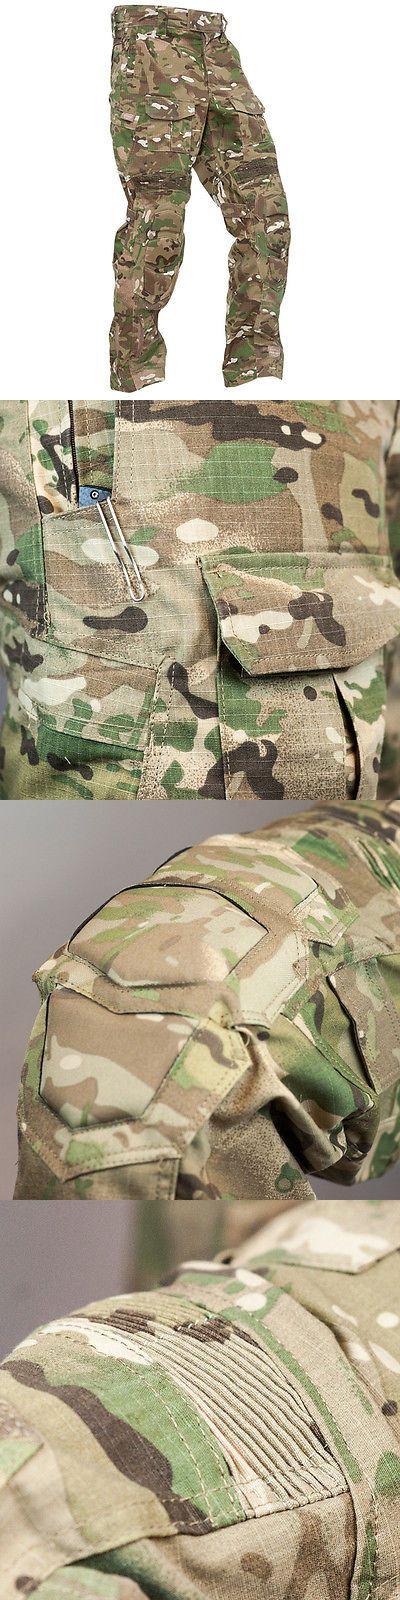 Pants and Shorts 165940: Valken Tango Combat Pants - Ocp -> BUY IT NOW ONLY: $99.95 on eBay!